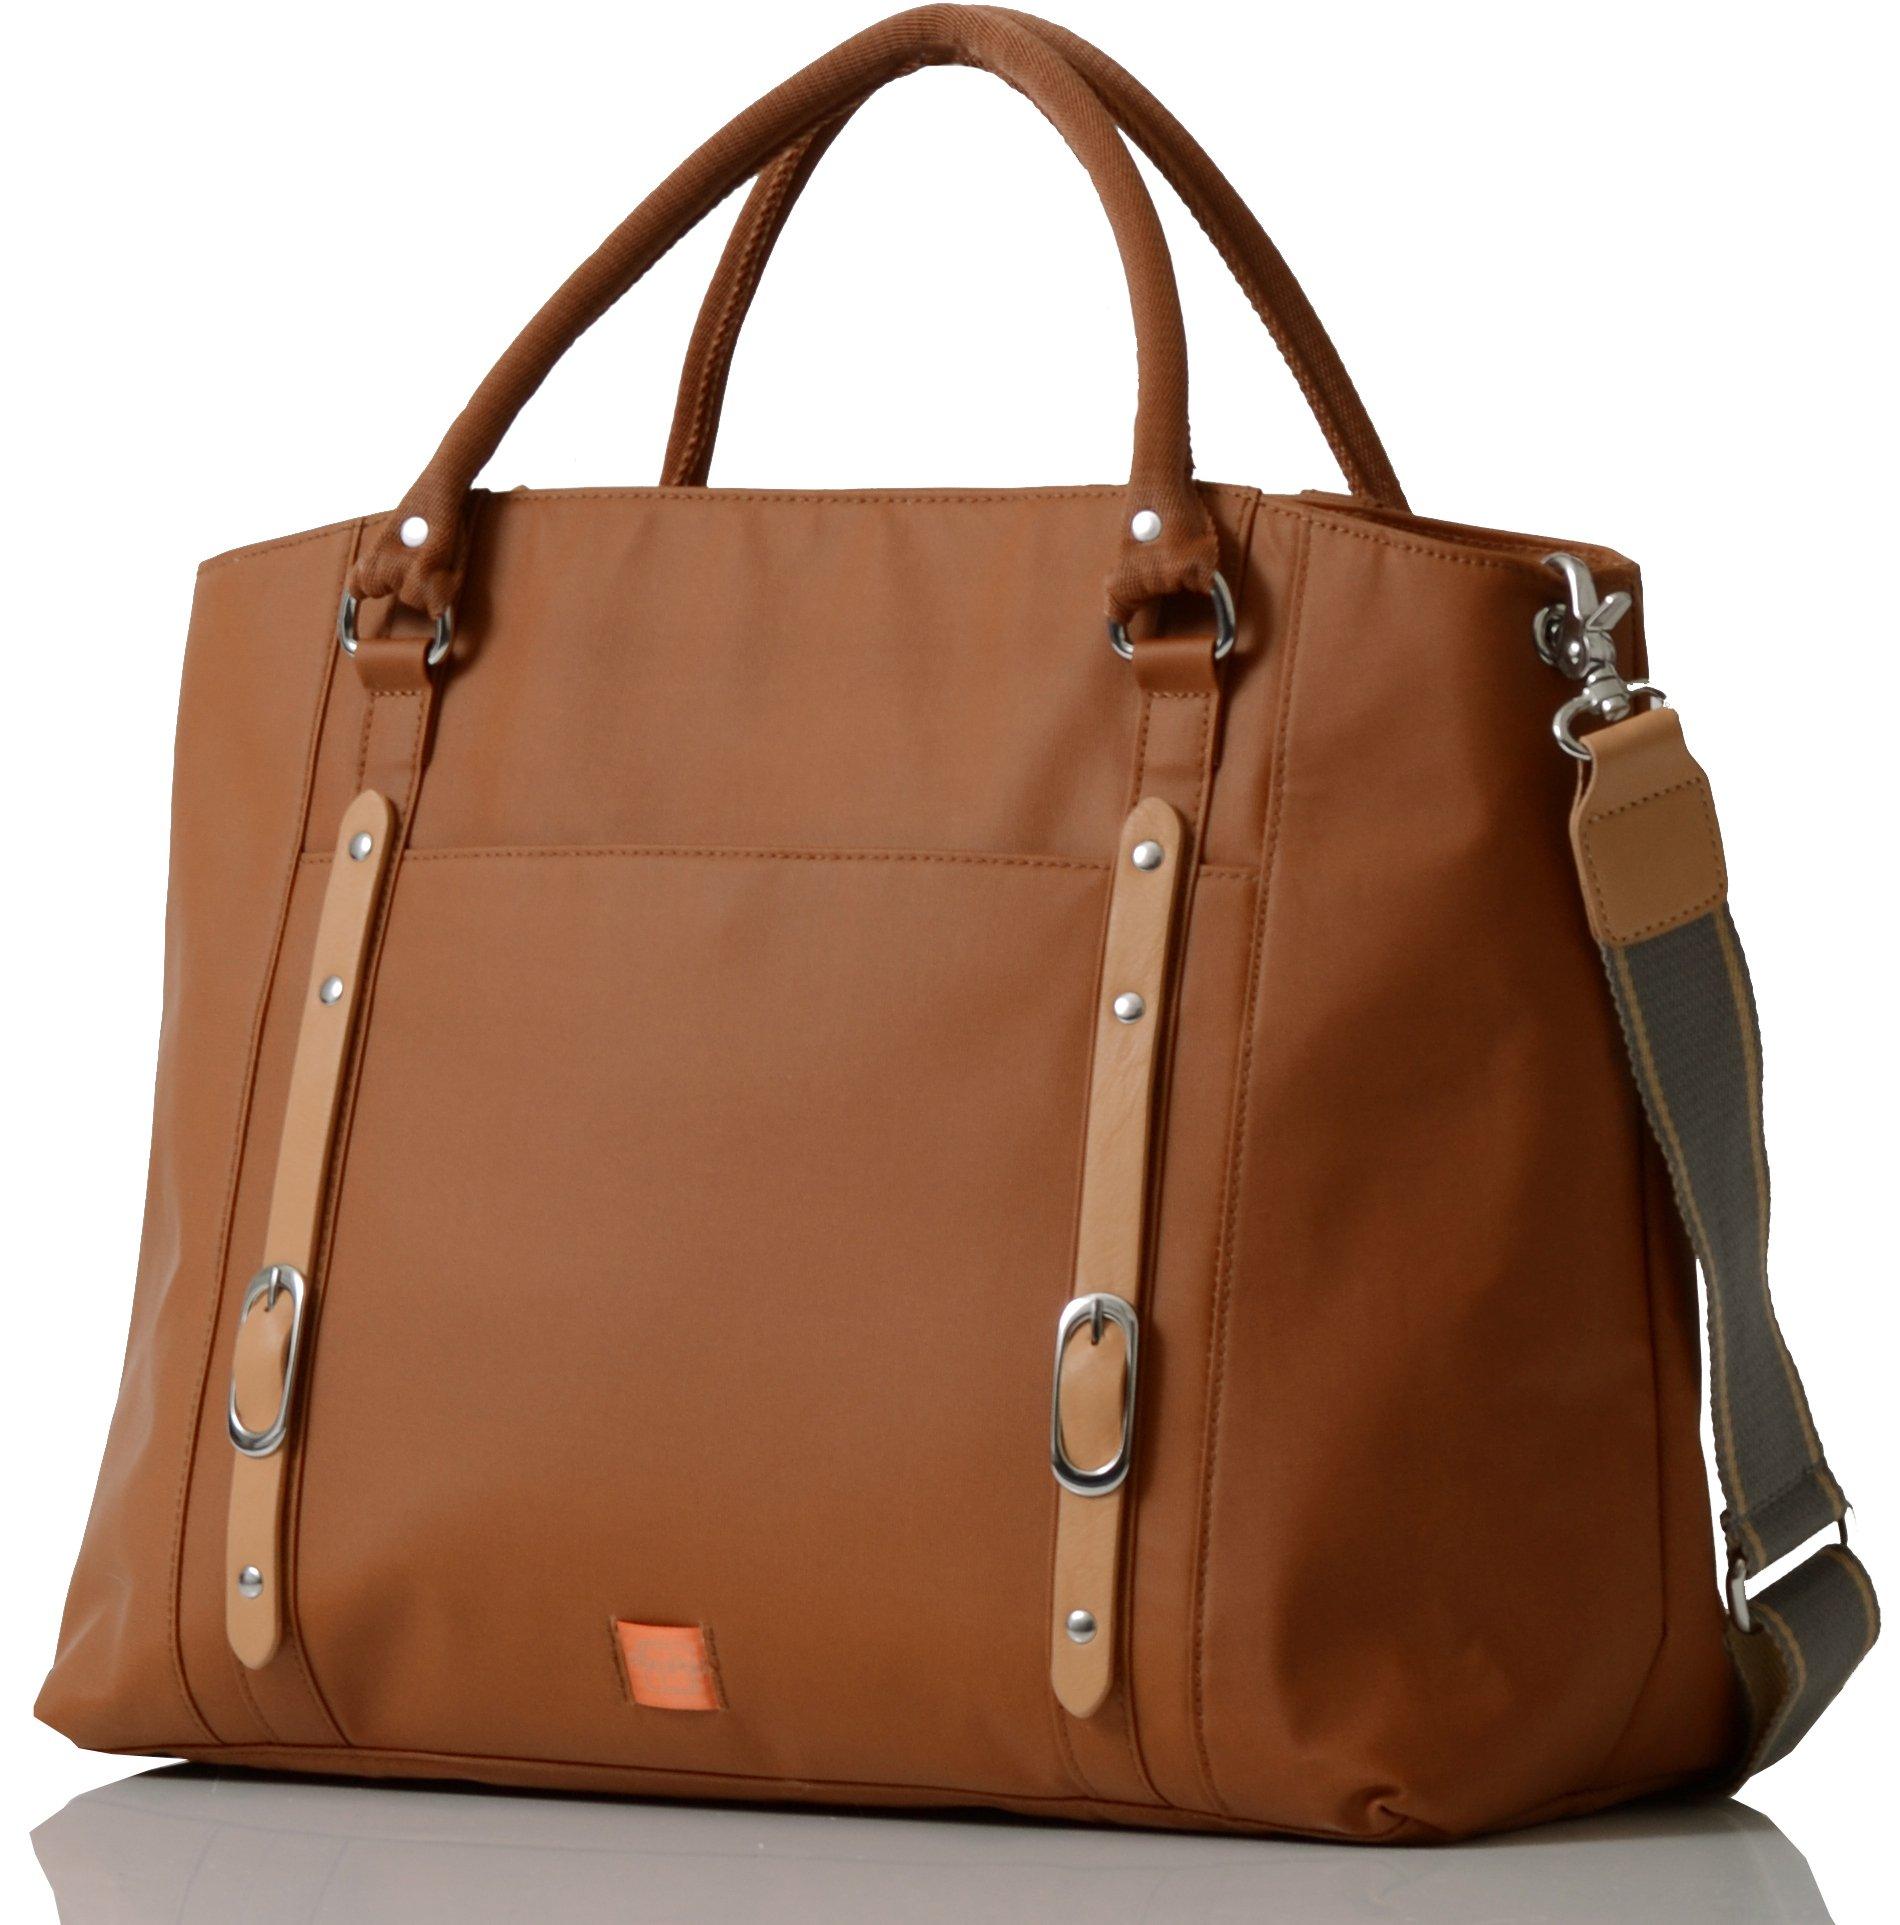 PacaPod Mirano Tan Designer Baby Diaper Bag - Luxury Tan Tote 3 in 1 Organising System